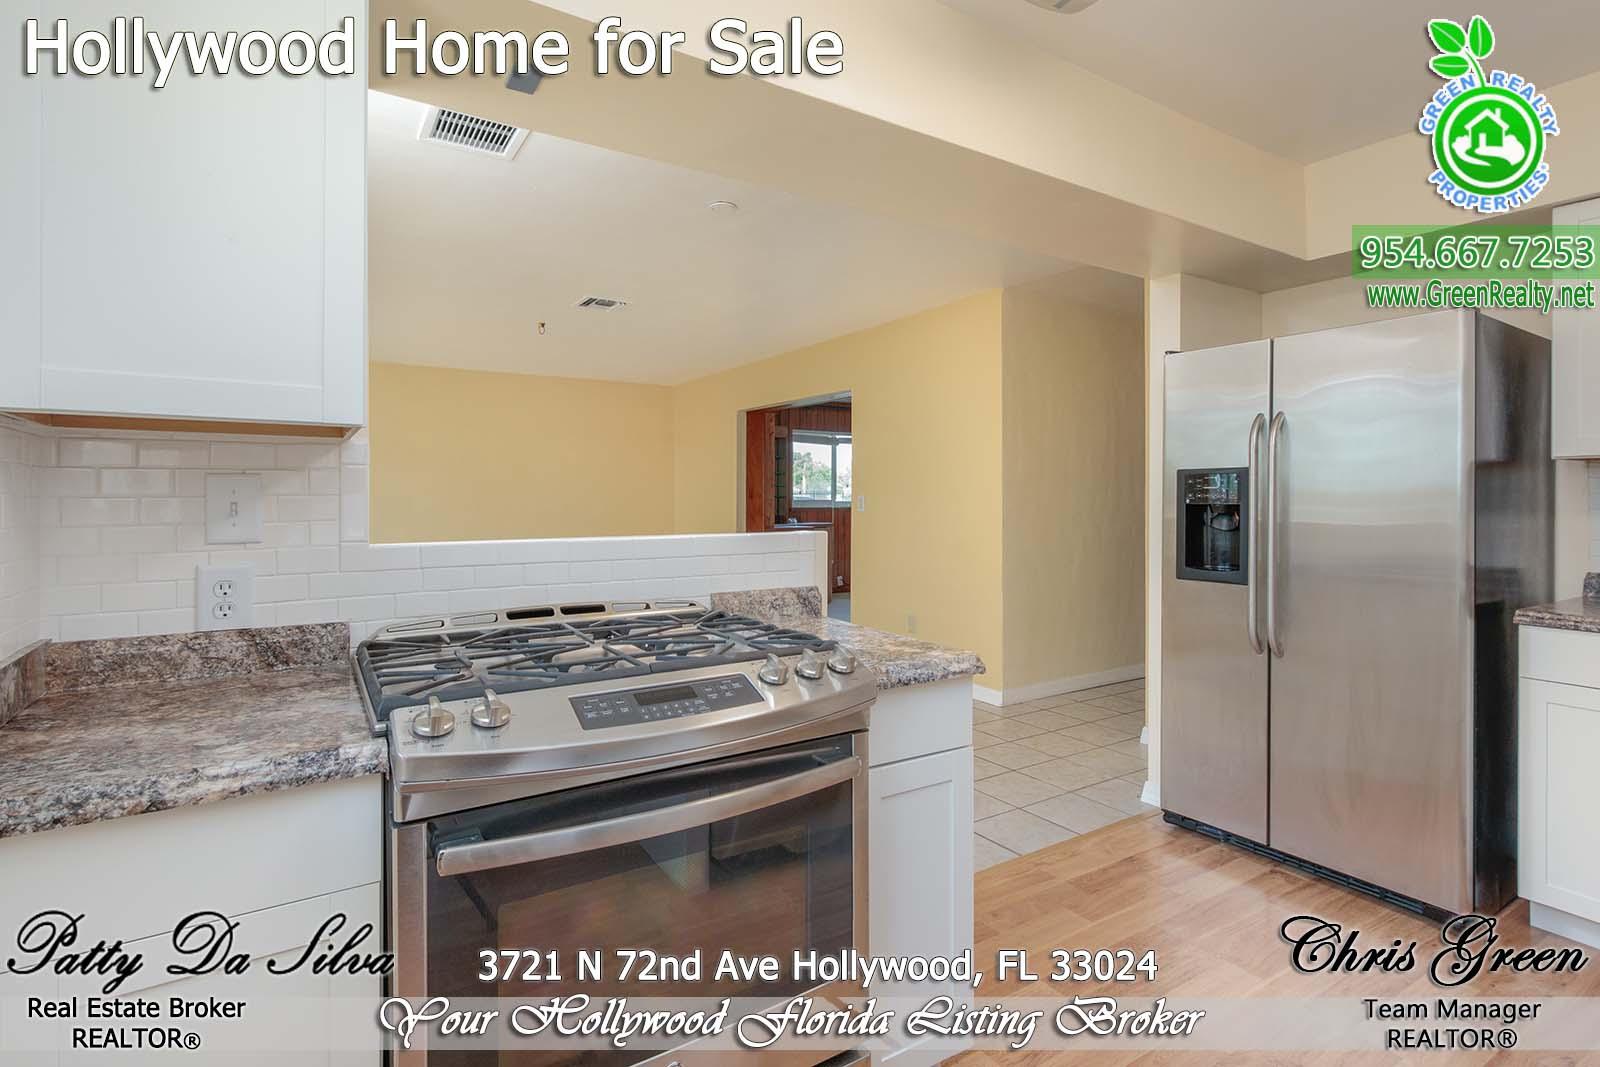 7 Hollywood Florida Real Estate Listing Patty Da Silva Green Realty properties (8)